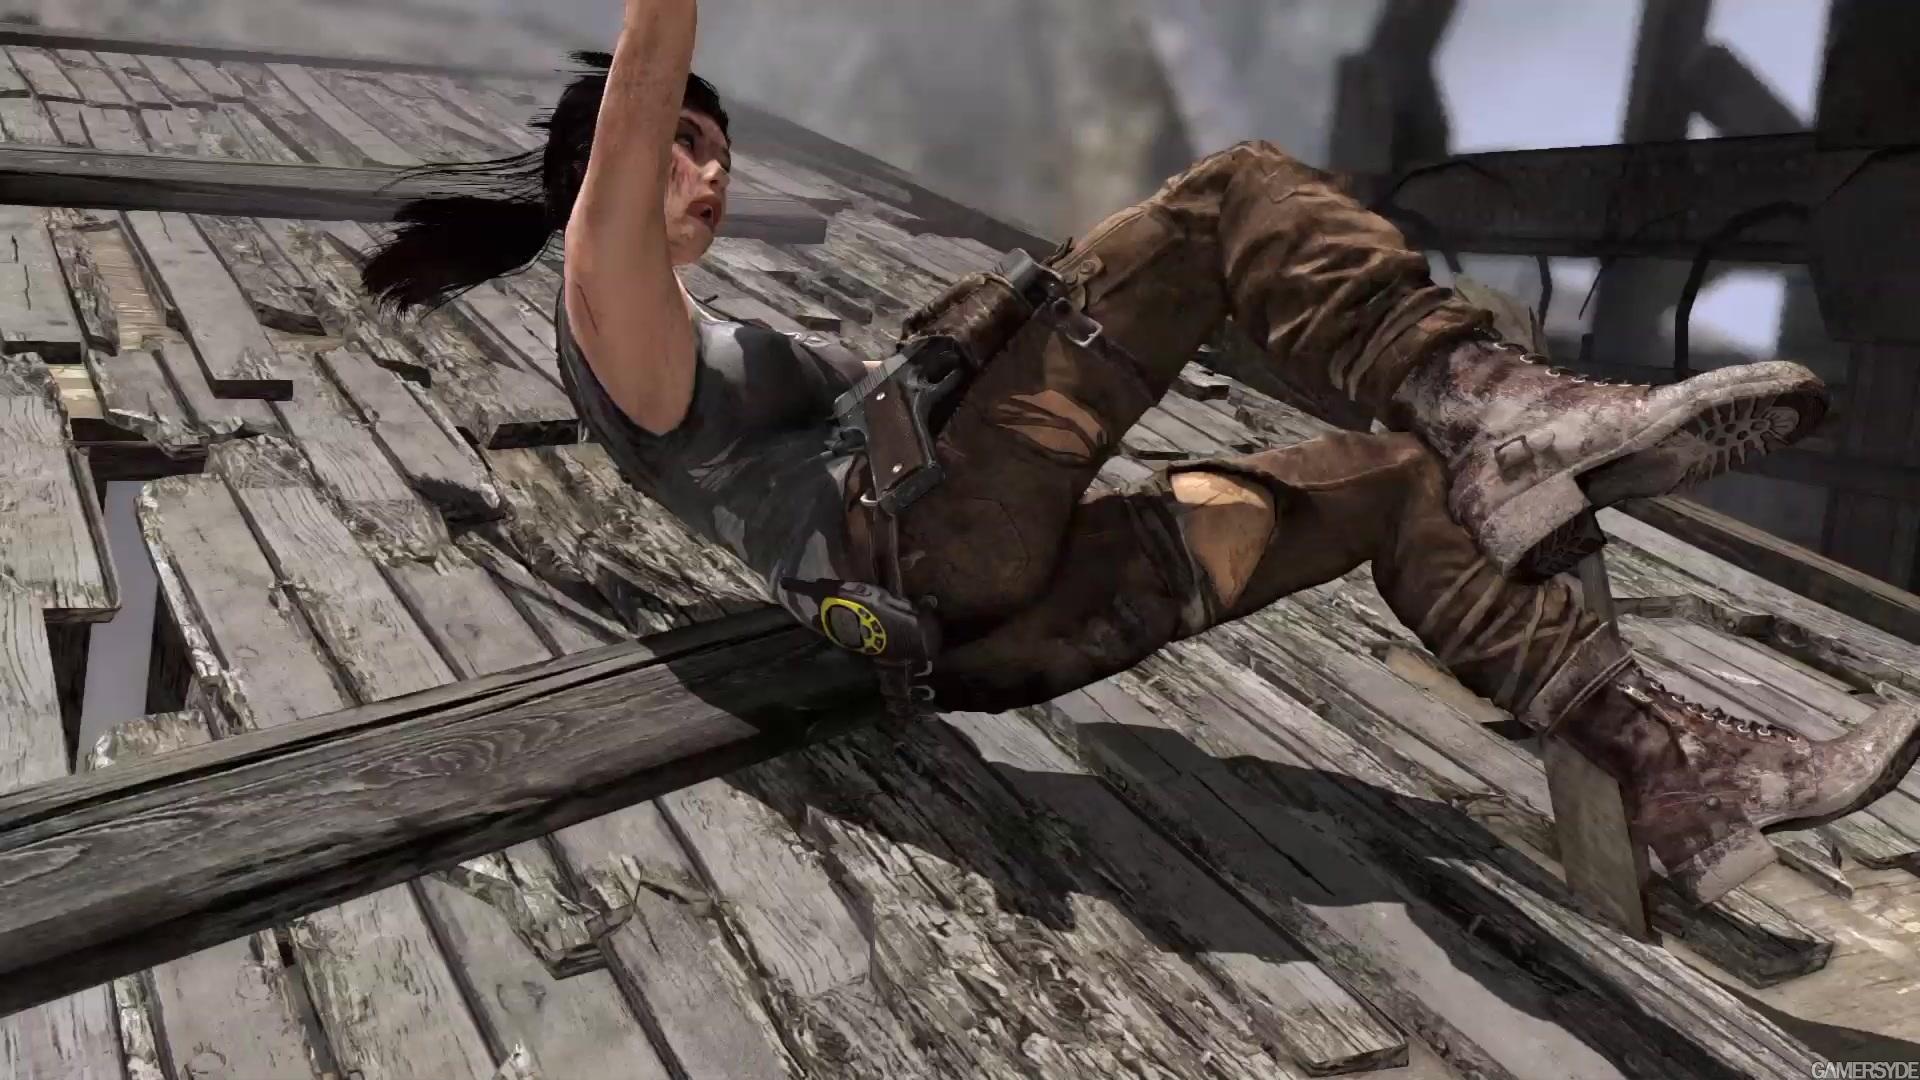 image tomb raider 24052 1912 0022 تصاویر جدیدی از عنوان Tomb Raider: Definitive Edition منتشر شد